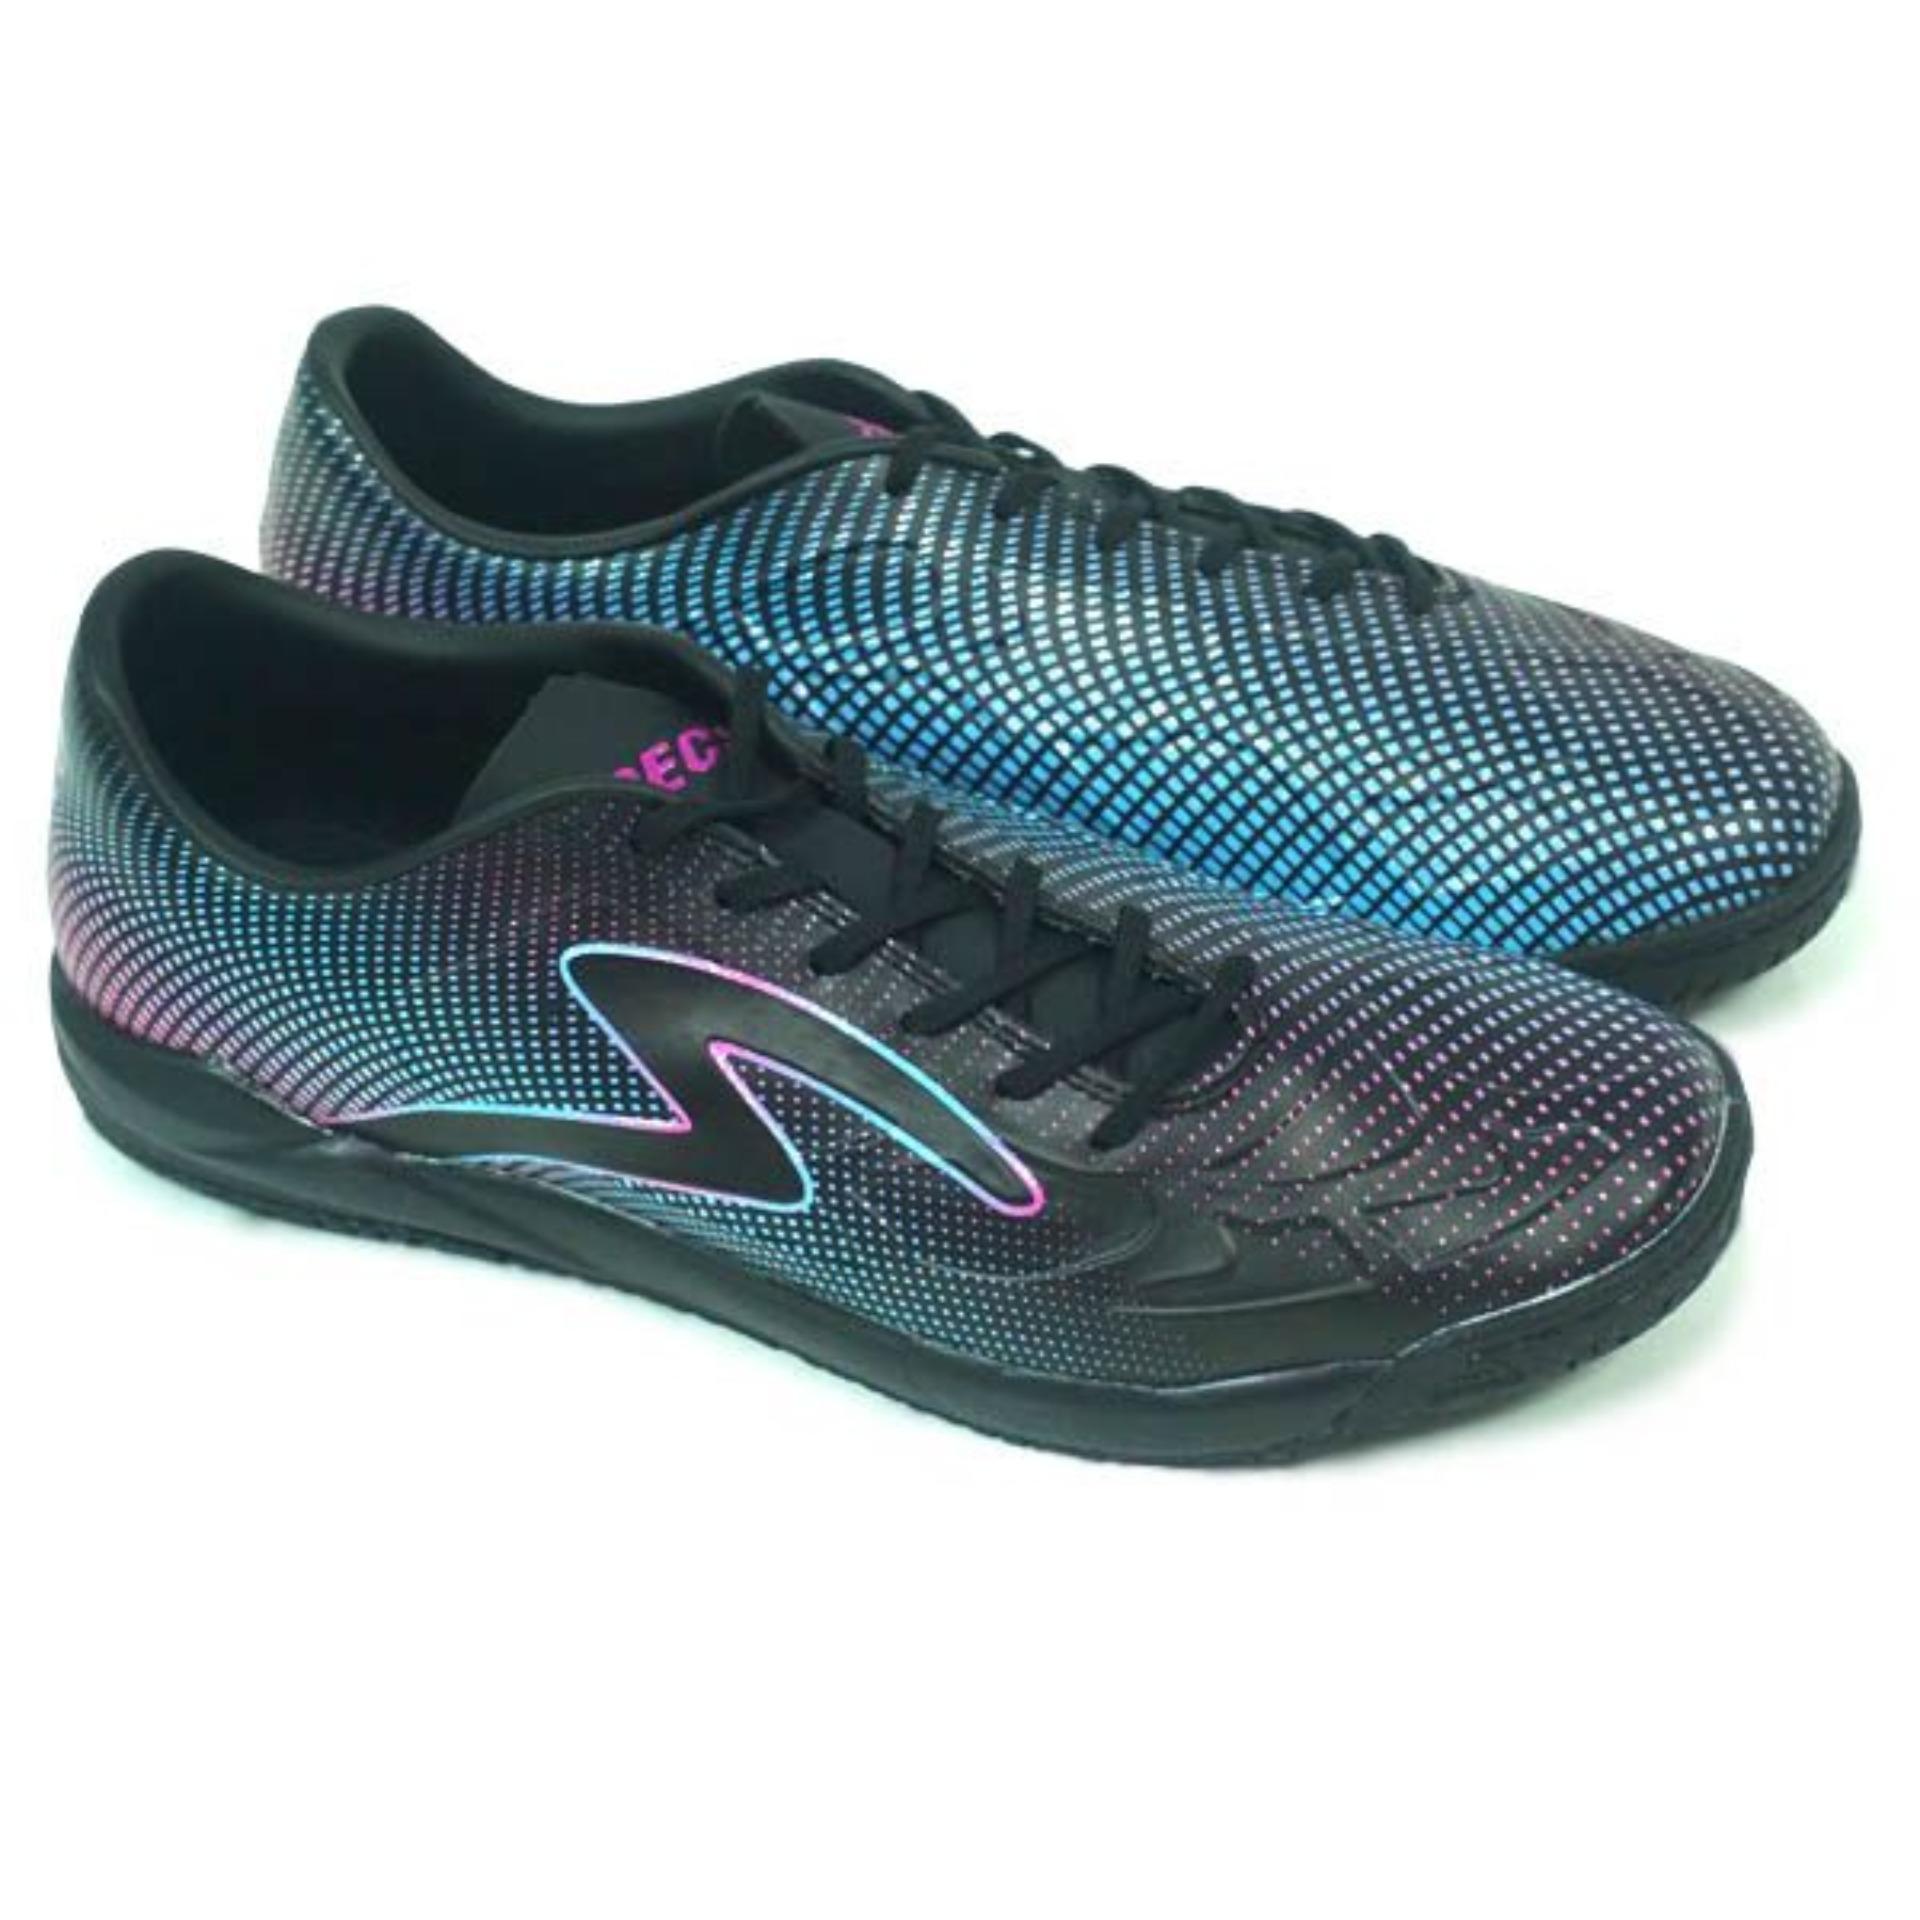 Specs Swervo Thunderbolt In Ultra Violet  Sepatu Futsal